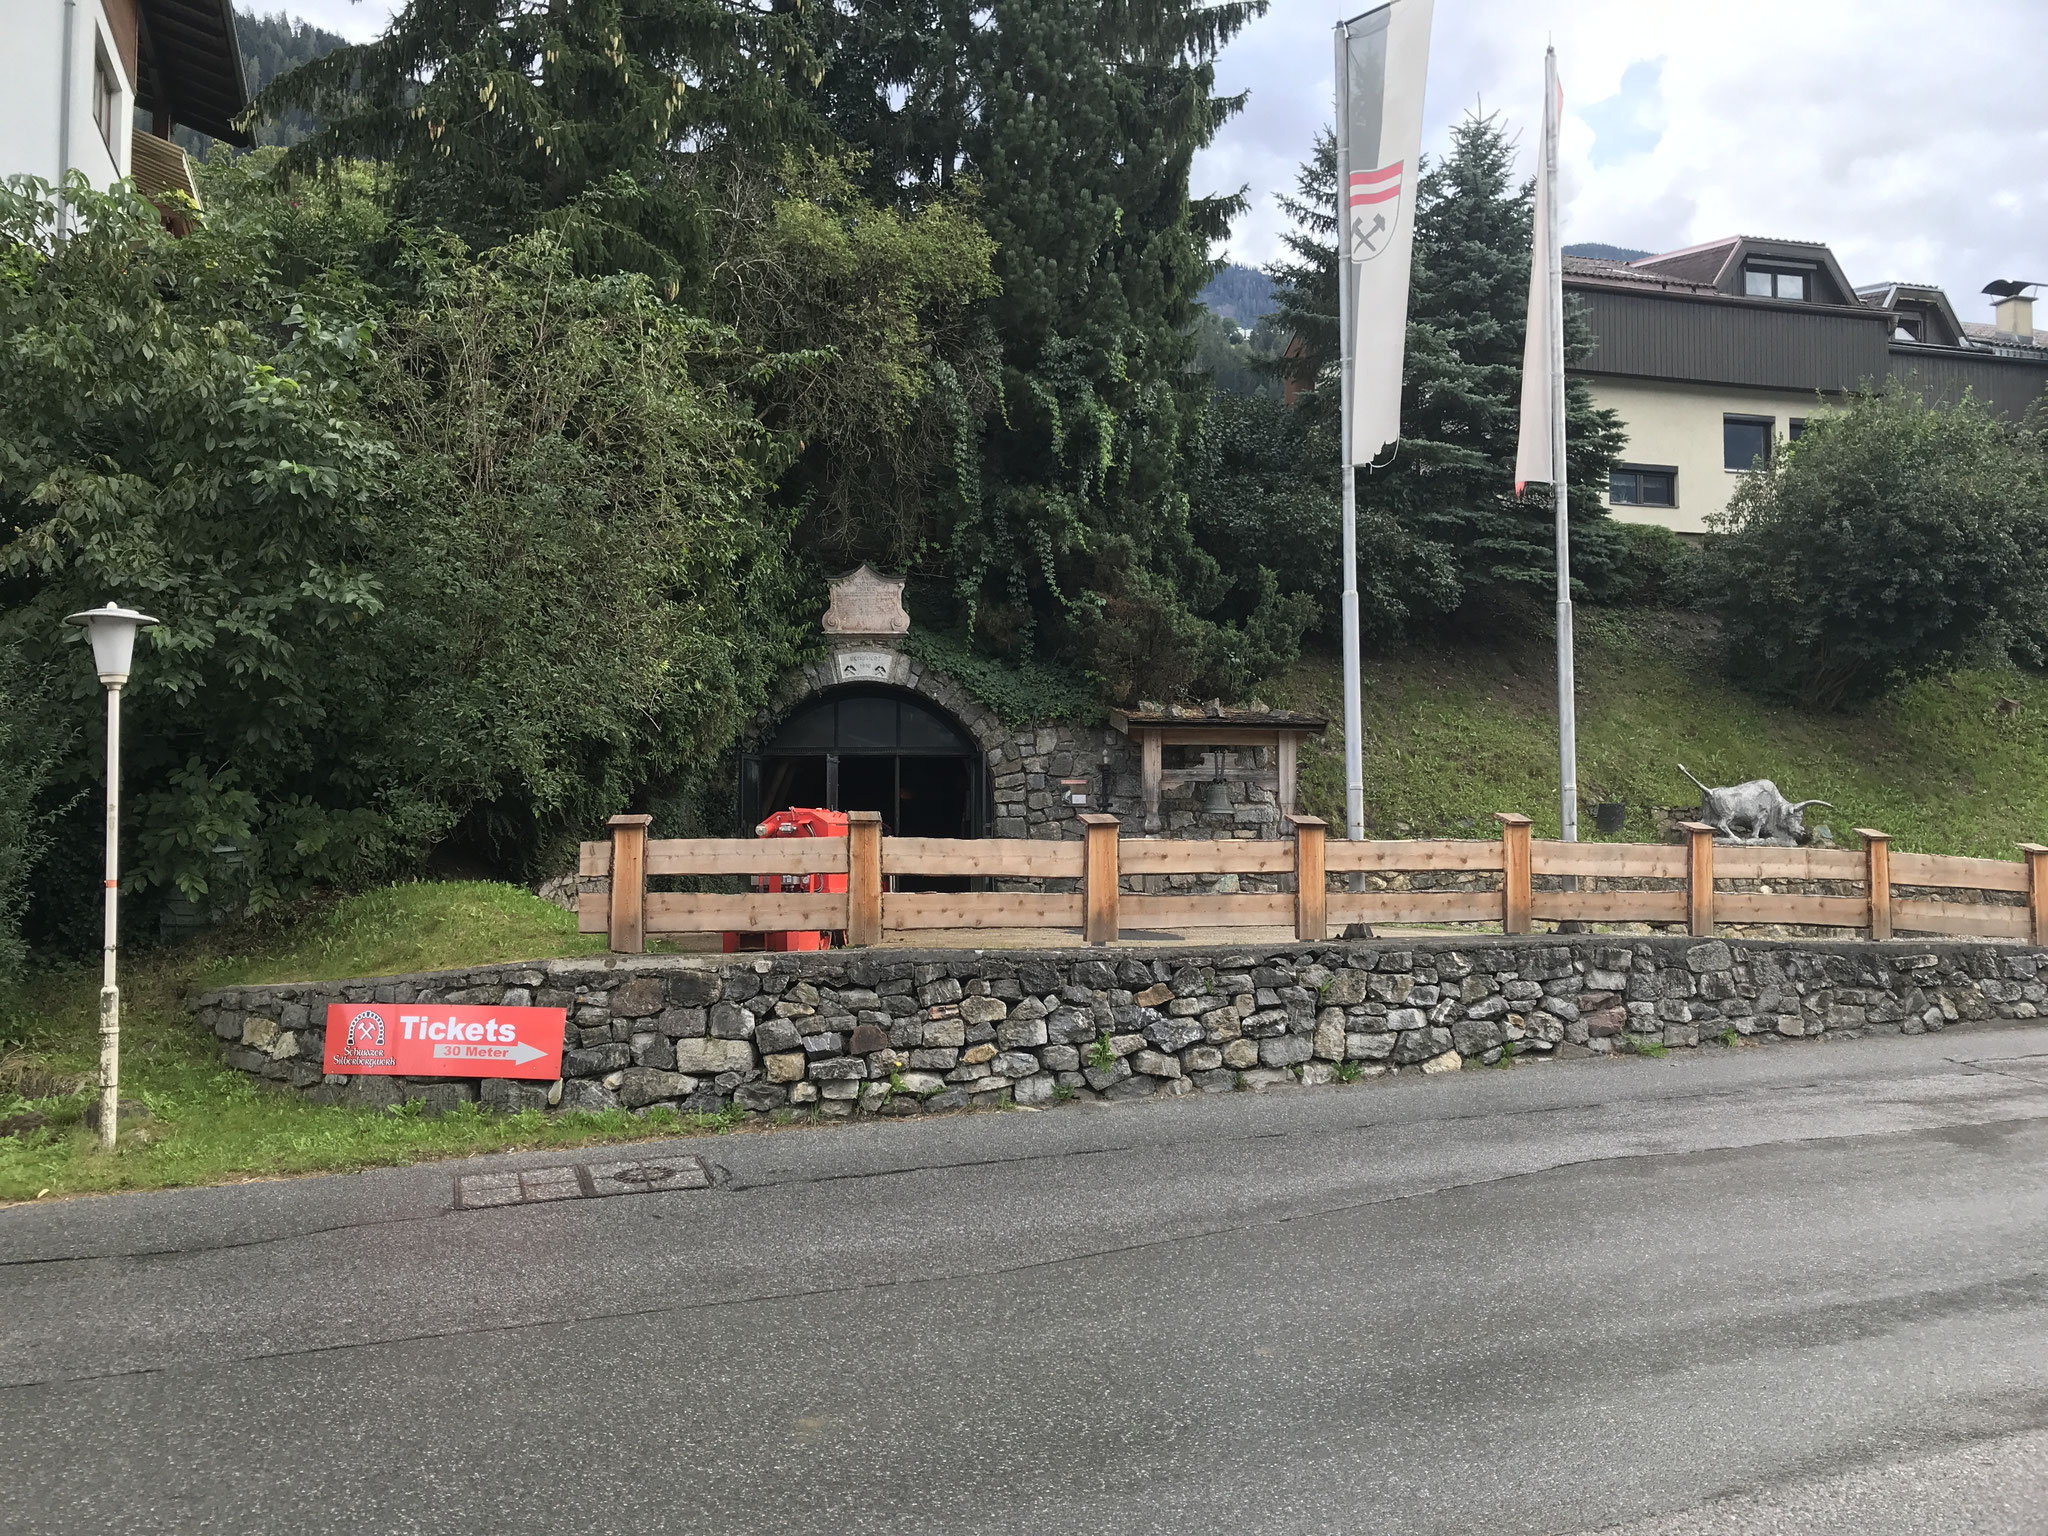 Next Stop: Silberbergwerk Schwaz